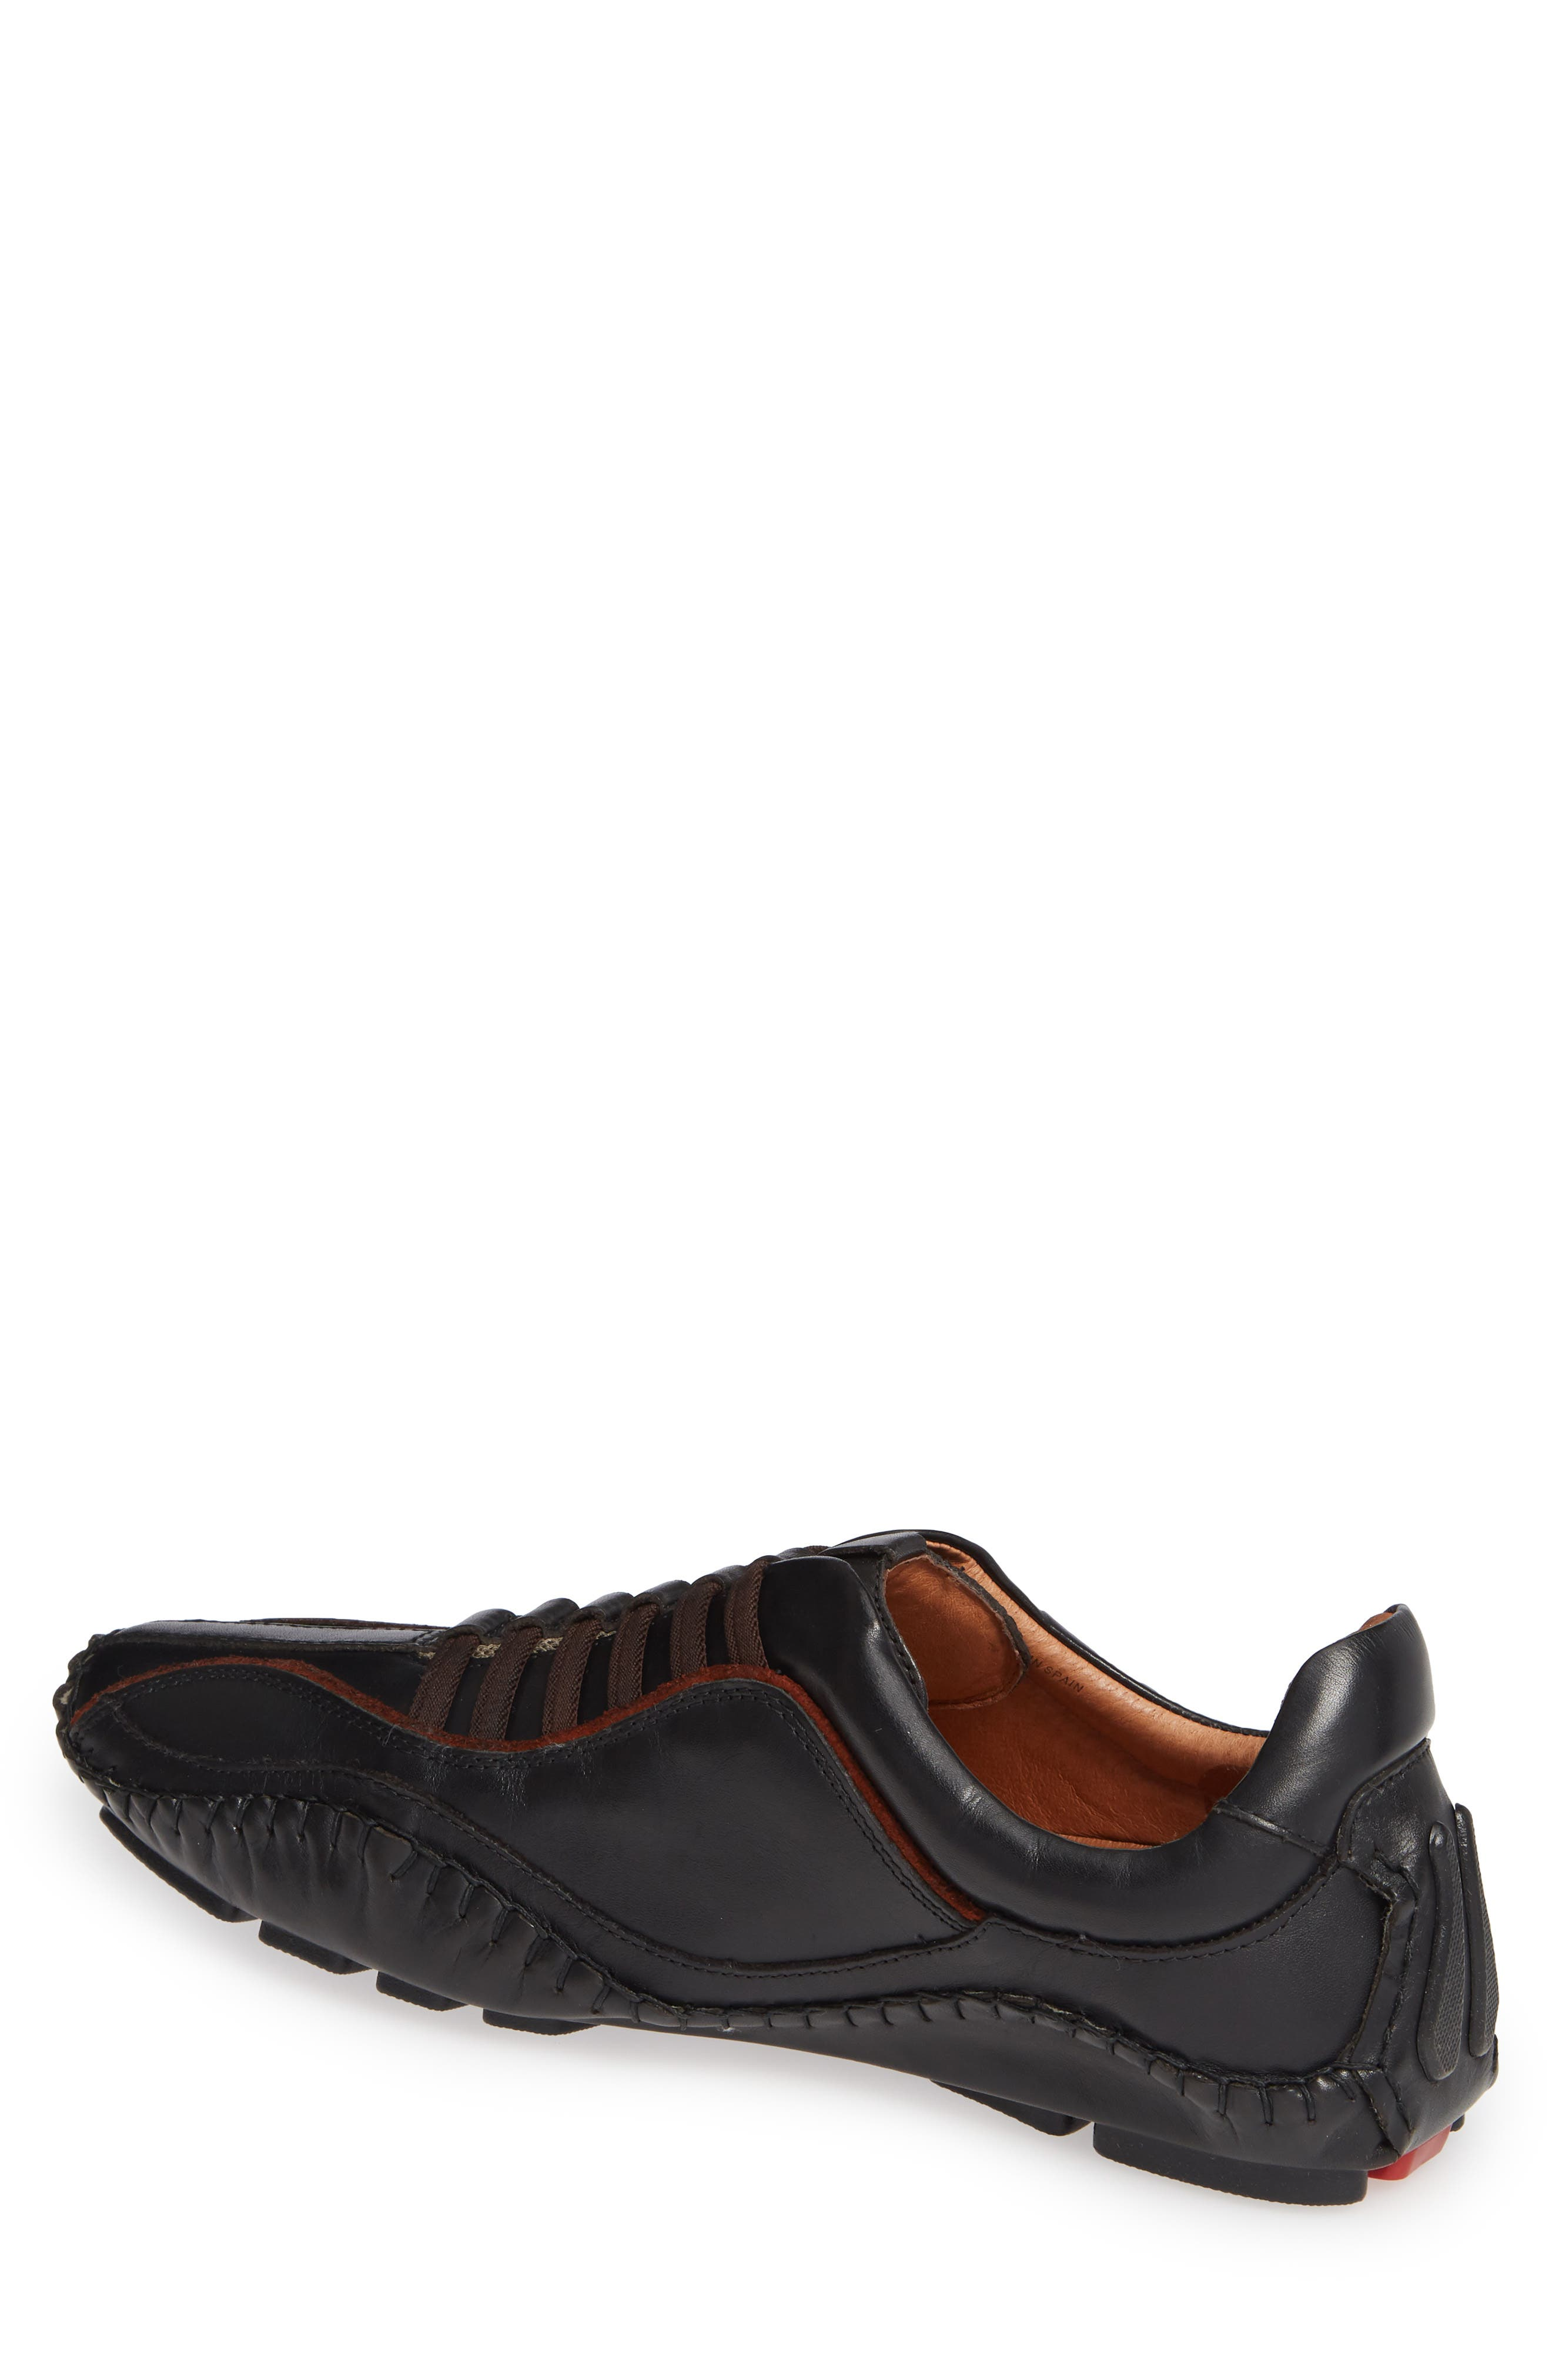 'Fuencarral' Driving Shoe,                             Alternate thumbnail 2, color,                             BLACK